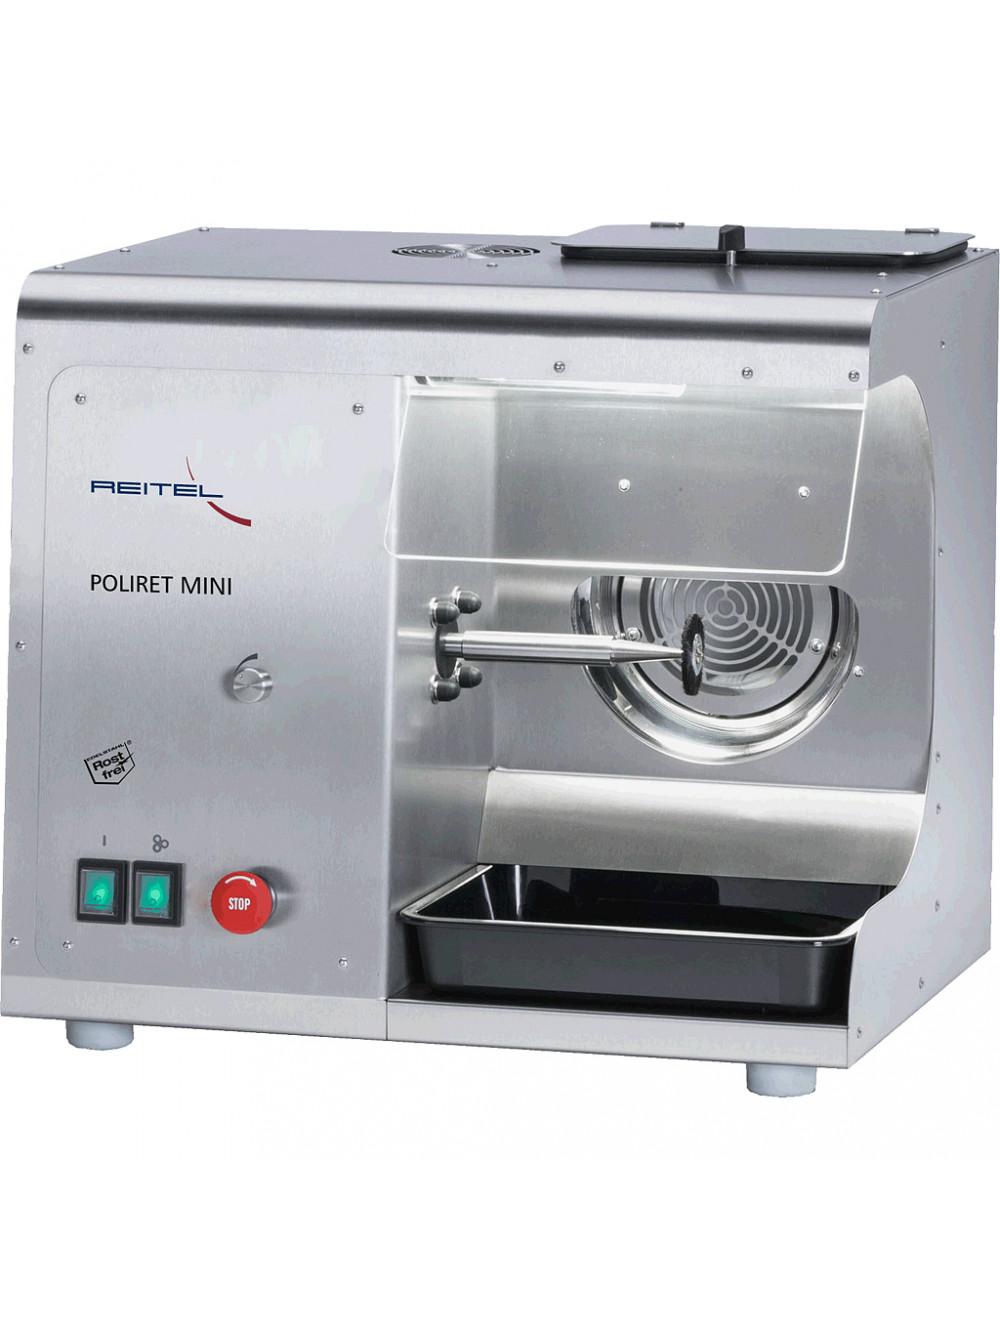 Das Produkt Reitel POLIRET MINI Poliergerät 11100000 aus dem Global-dent online shop.